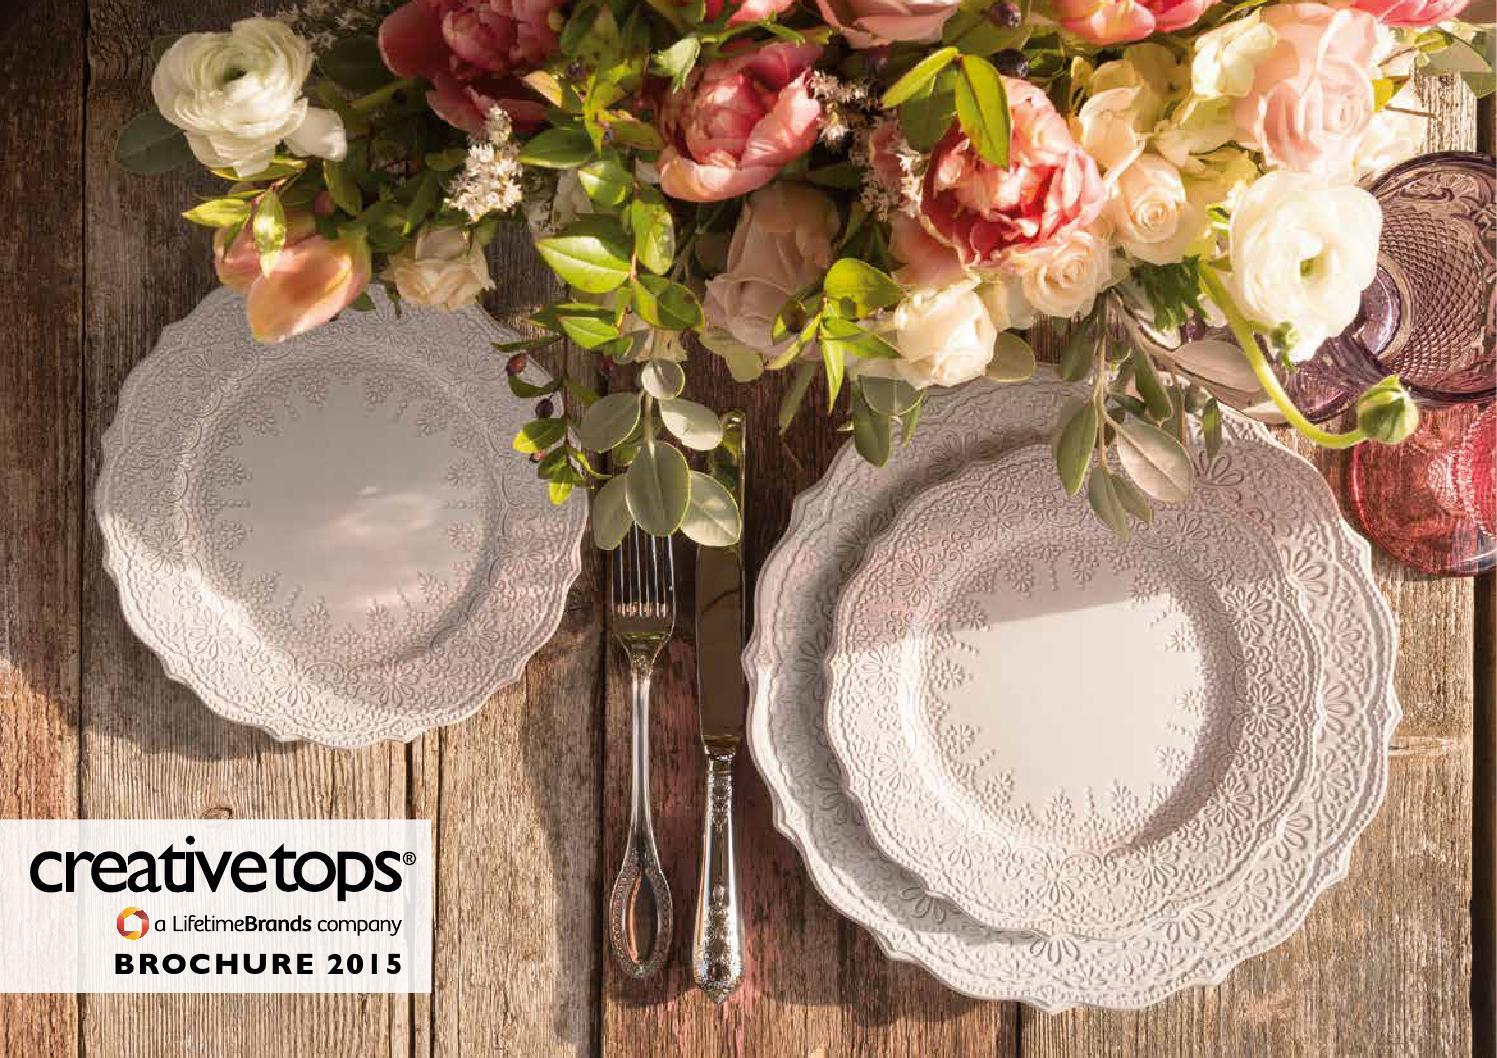 Creative Tops Katie Cupcake Alice Couture Porcelaine Six Coupe Tea Pot Hat Box